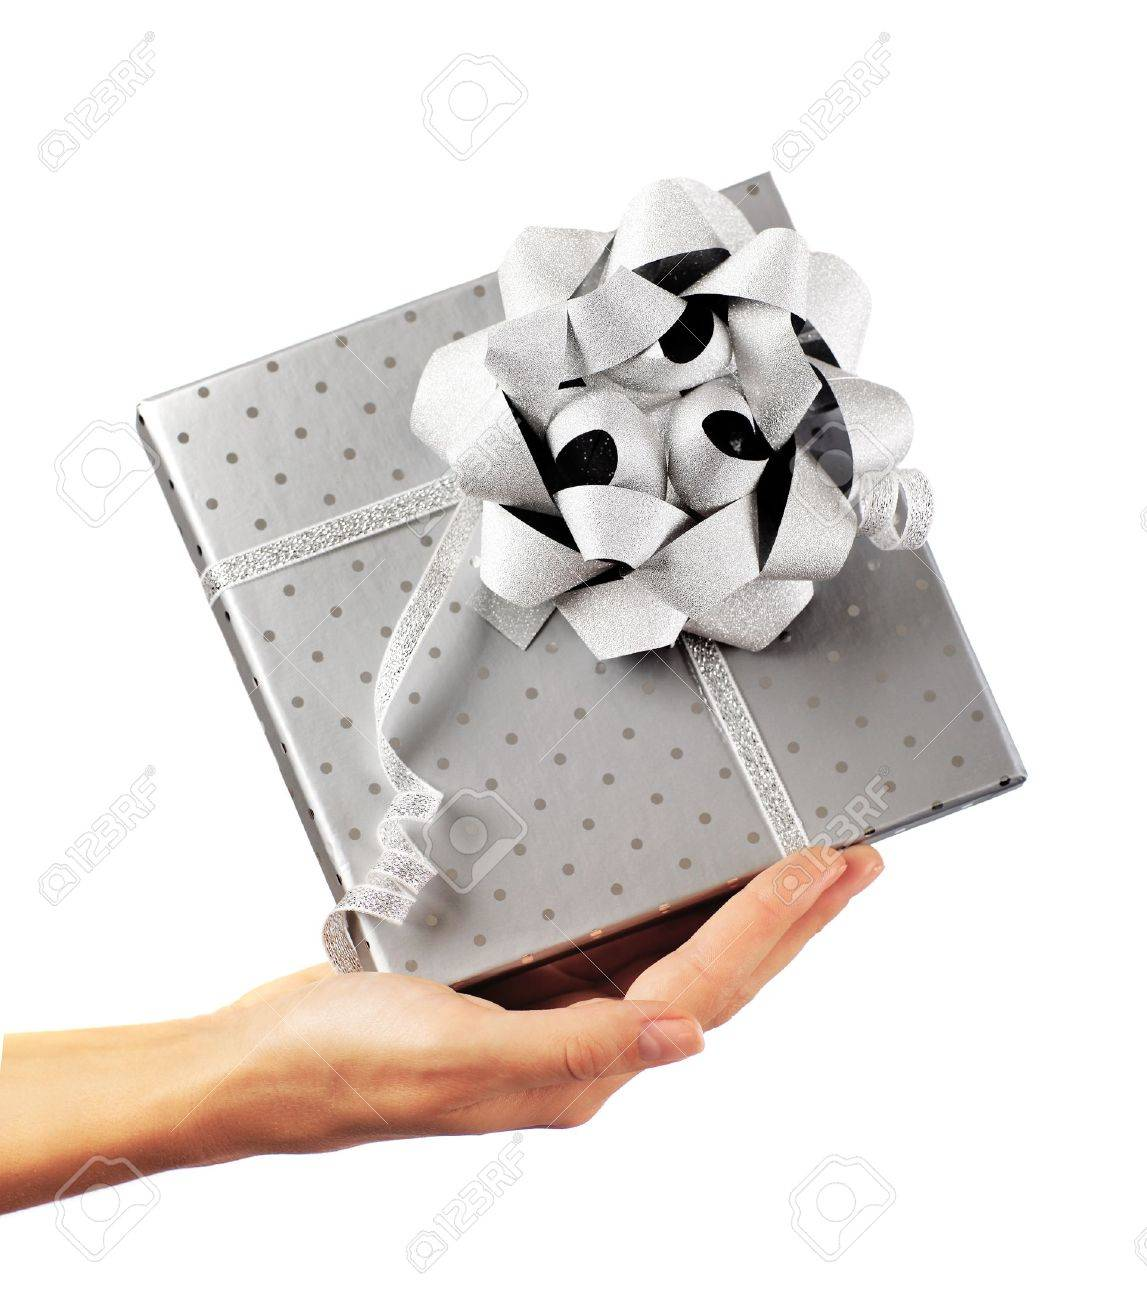 Woman Hand Hält Schönen Silbernen Geschenkkarton, Was Geschenk ...